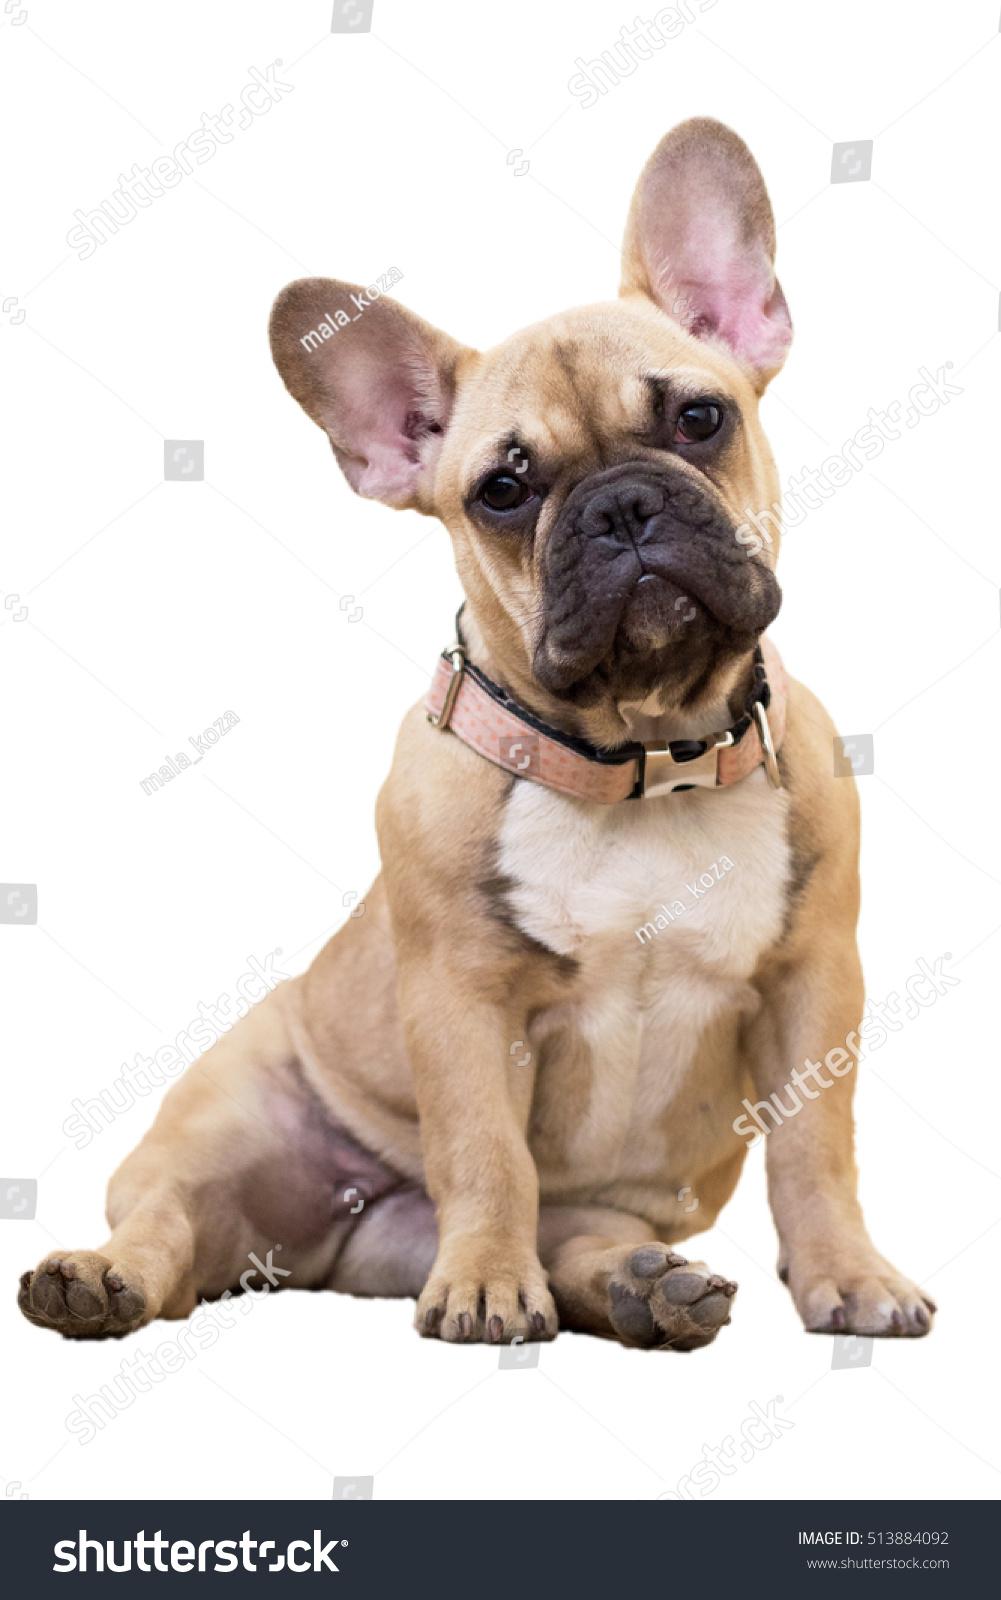 Fawn French Bulldog Puppy Sitting White Stock Photo Edit Now 513884092